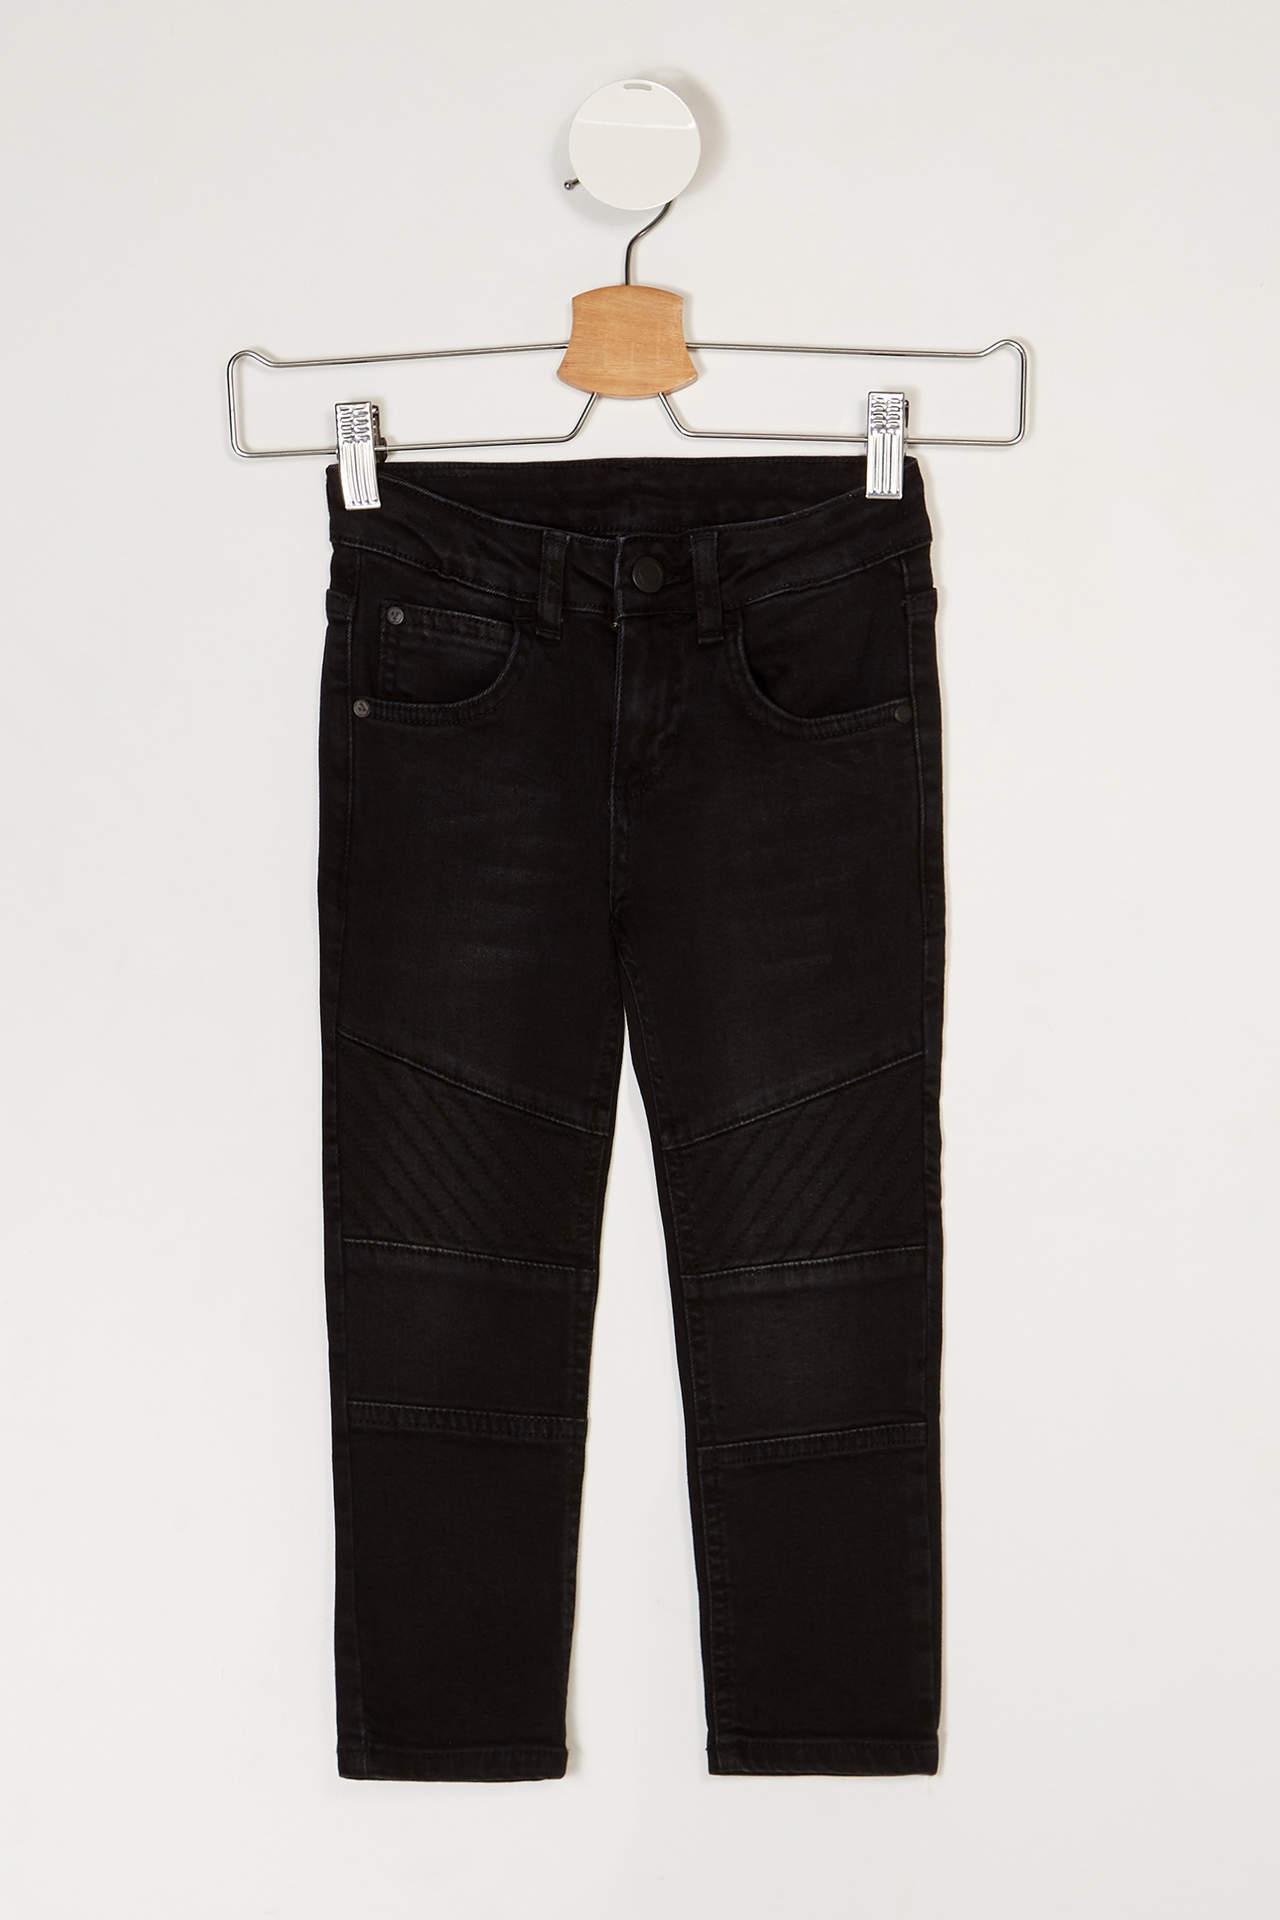 DeFacto Erkek Çocuk Slim Fit Jean Pantolon Siyah male